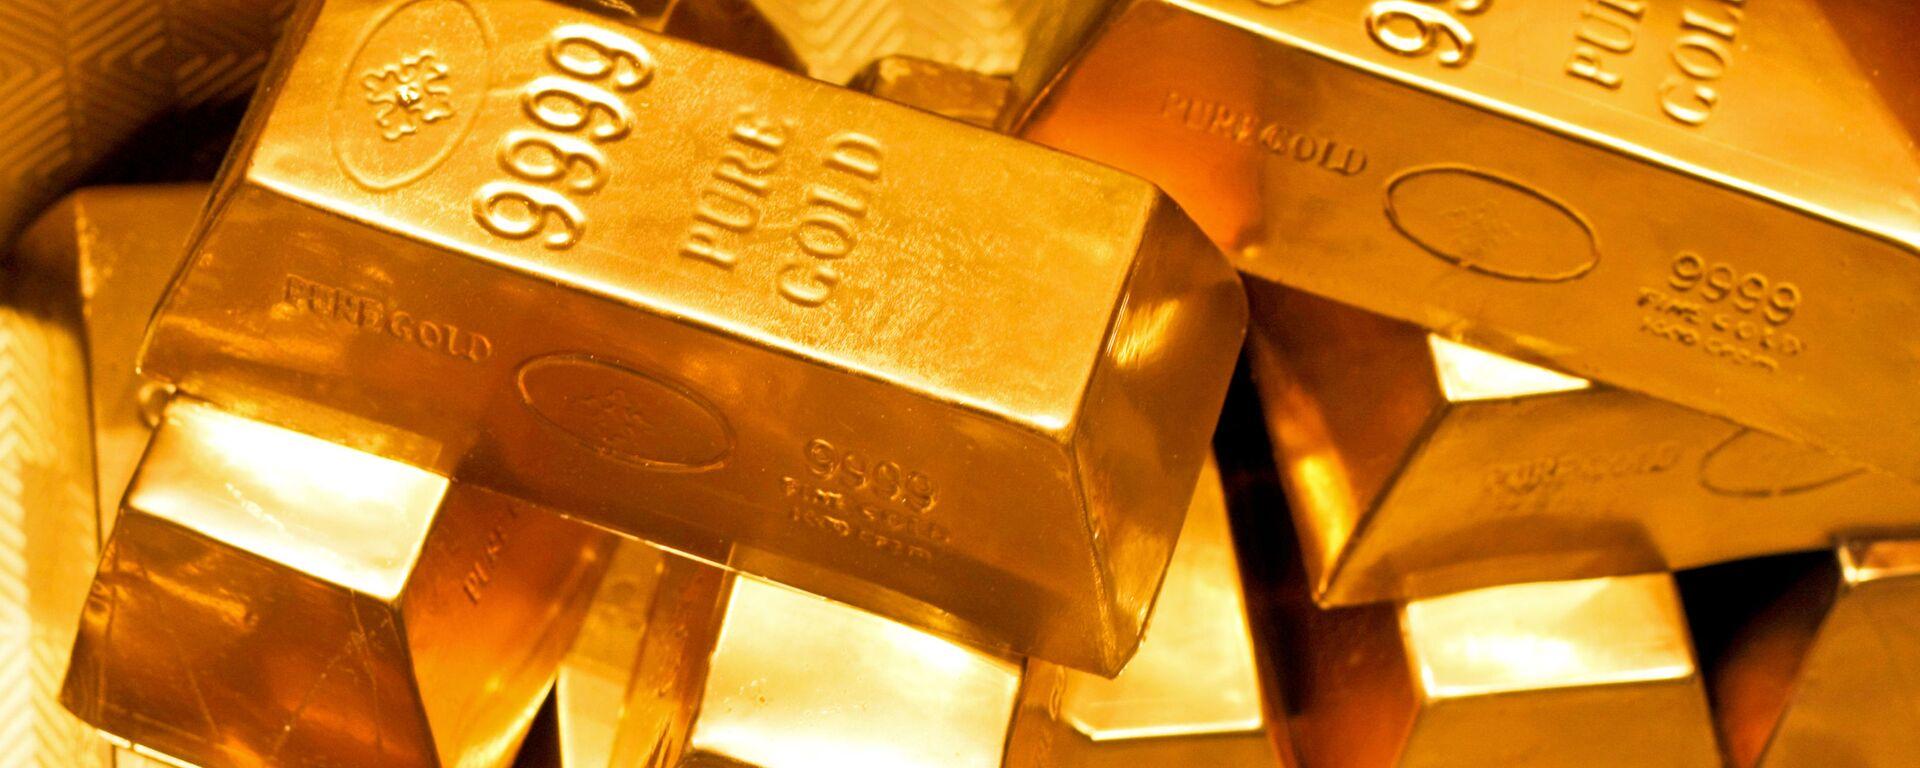 Gold (Symbolbild) - SNA, 1920, 13.09.2021